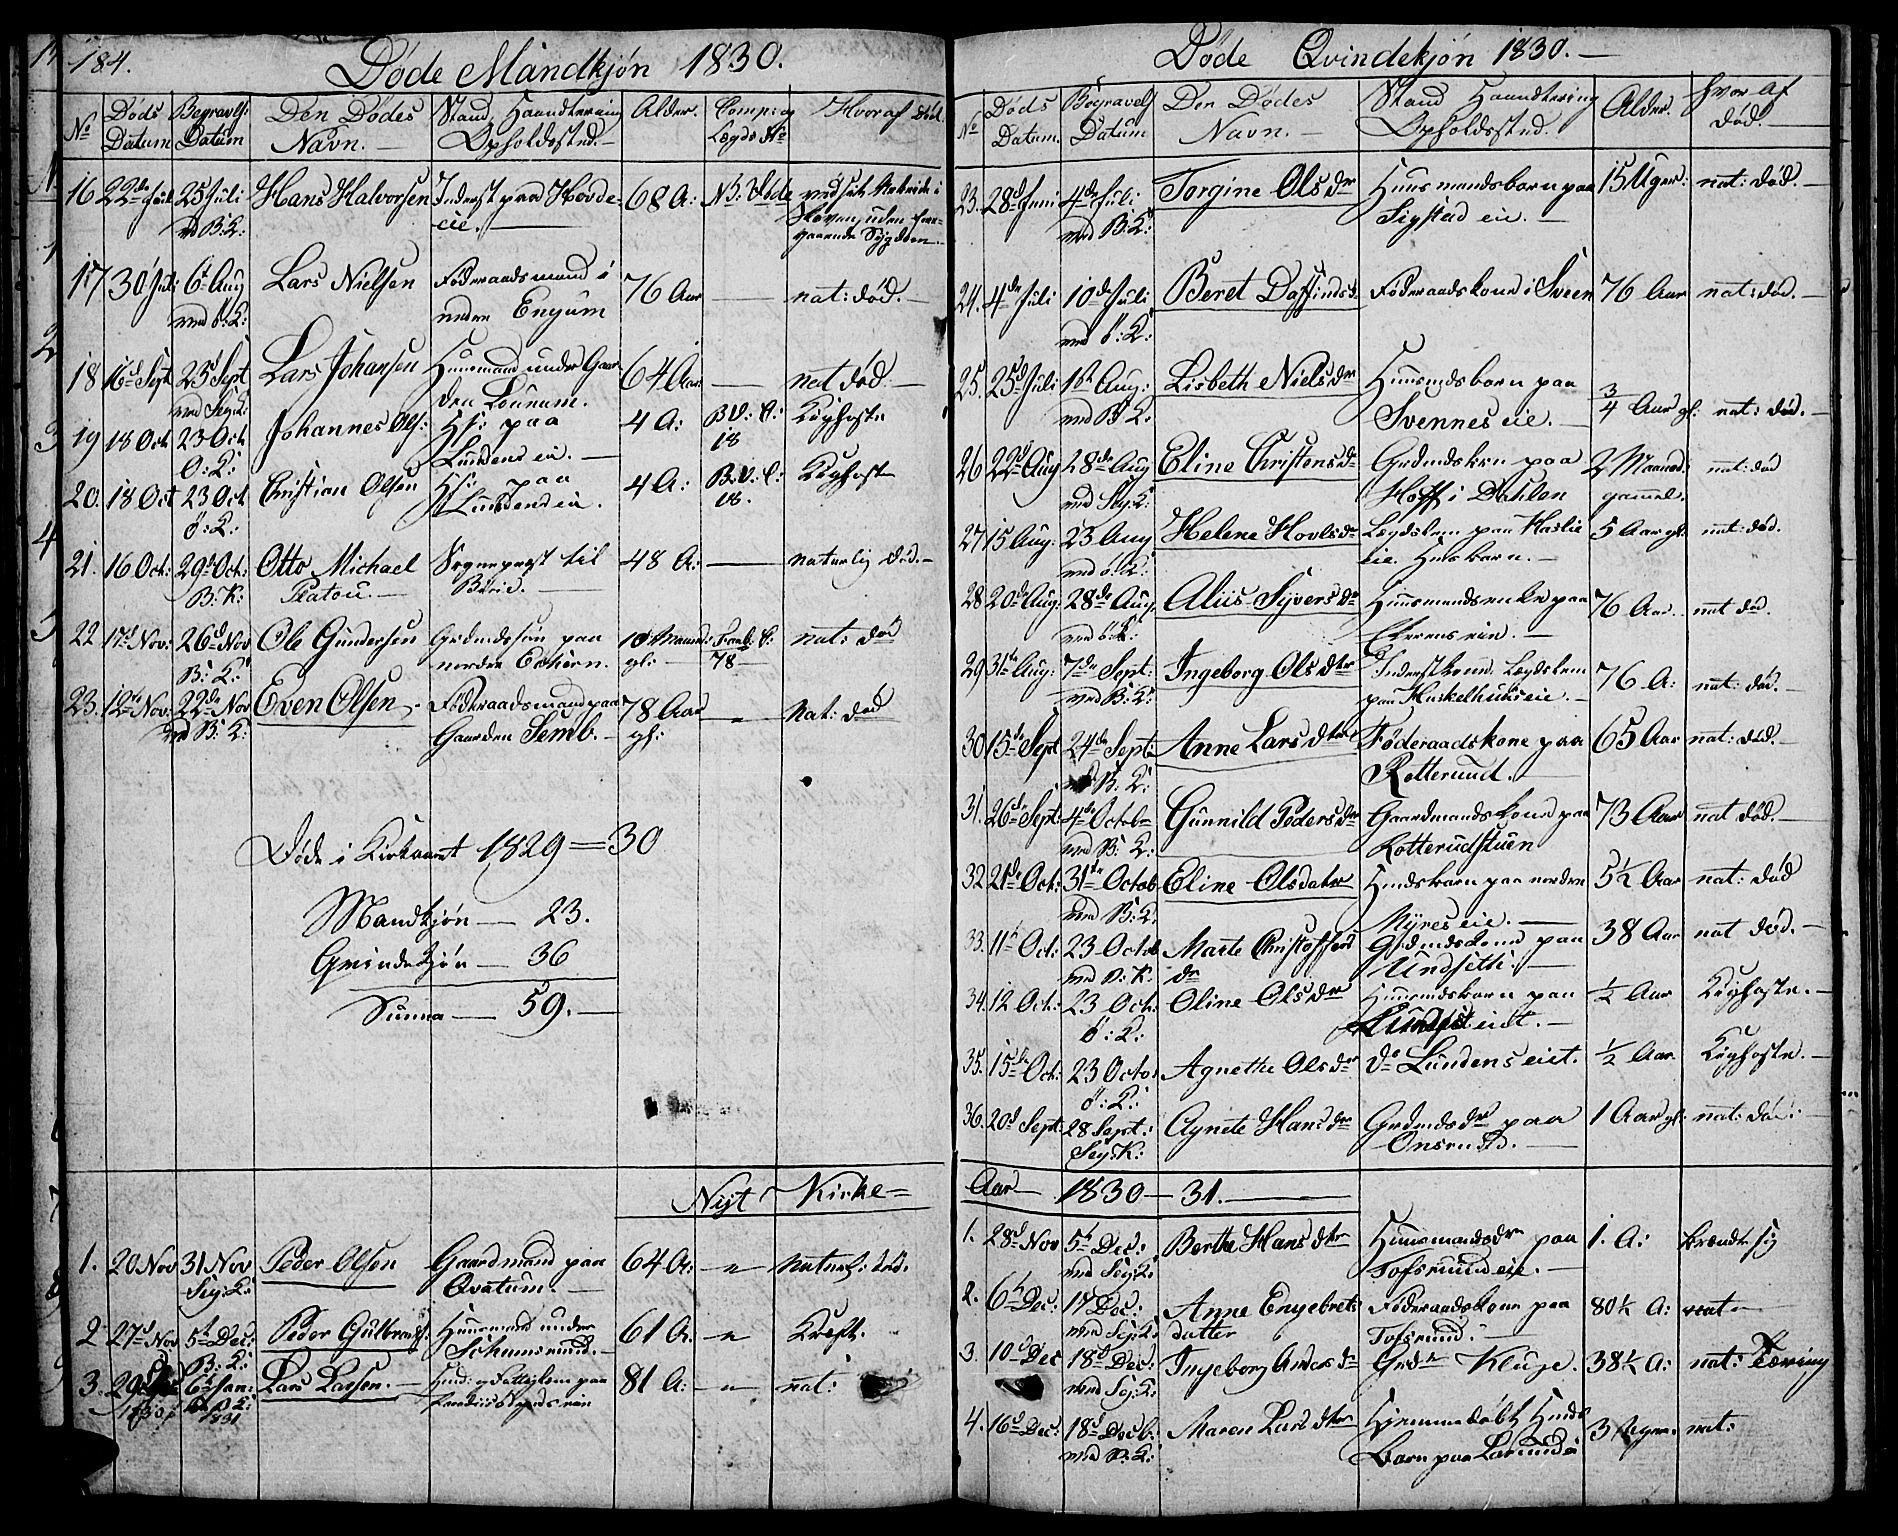 SAH, Biri prestekontor, Klokkerbok nr. 2, 1828-1842, s. 184